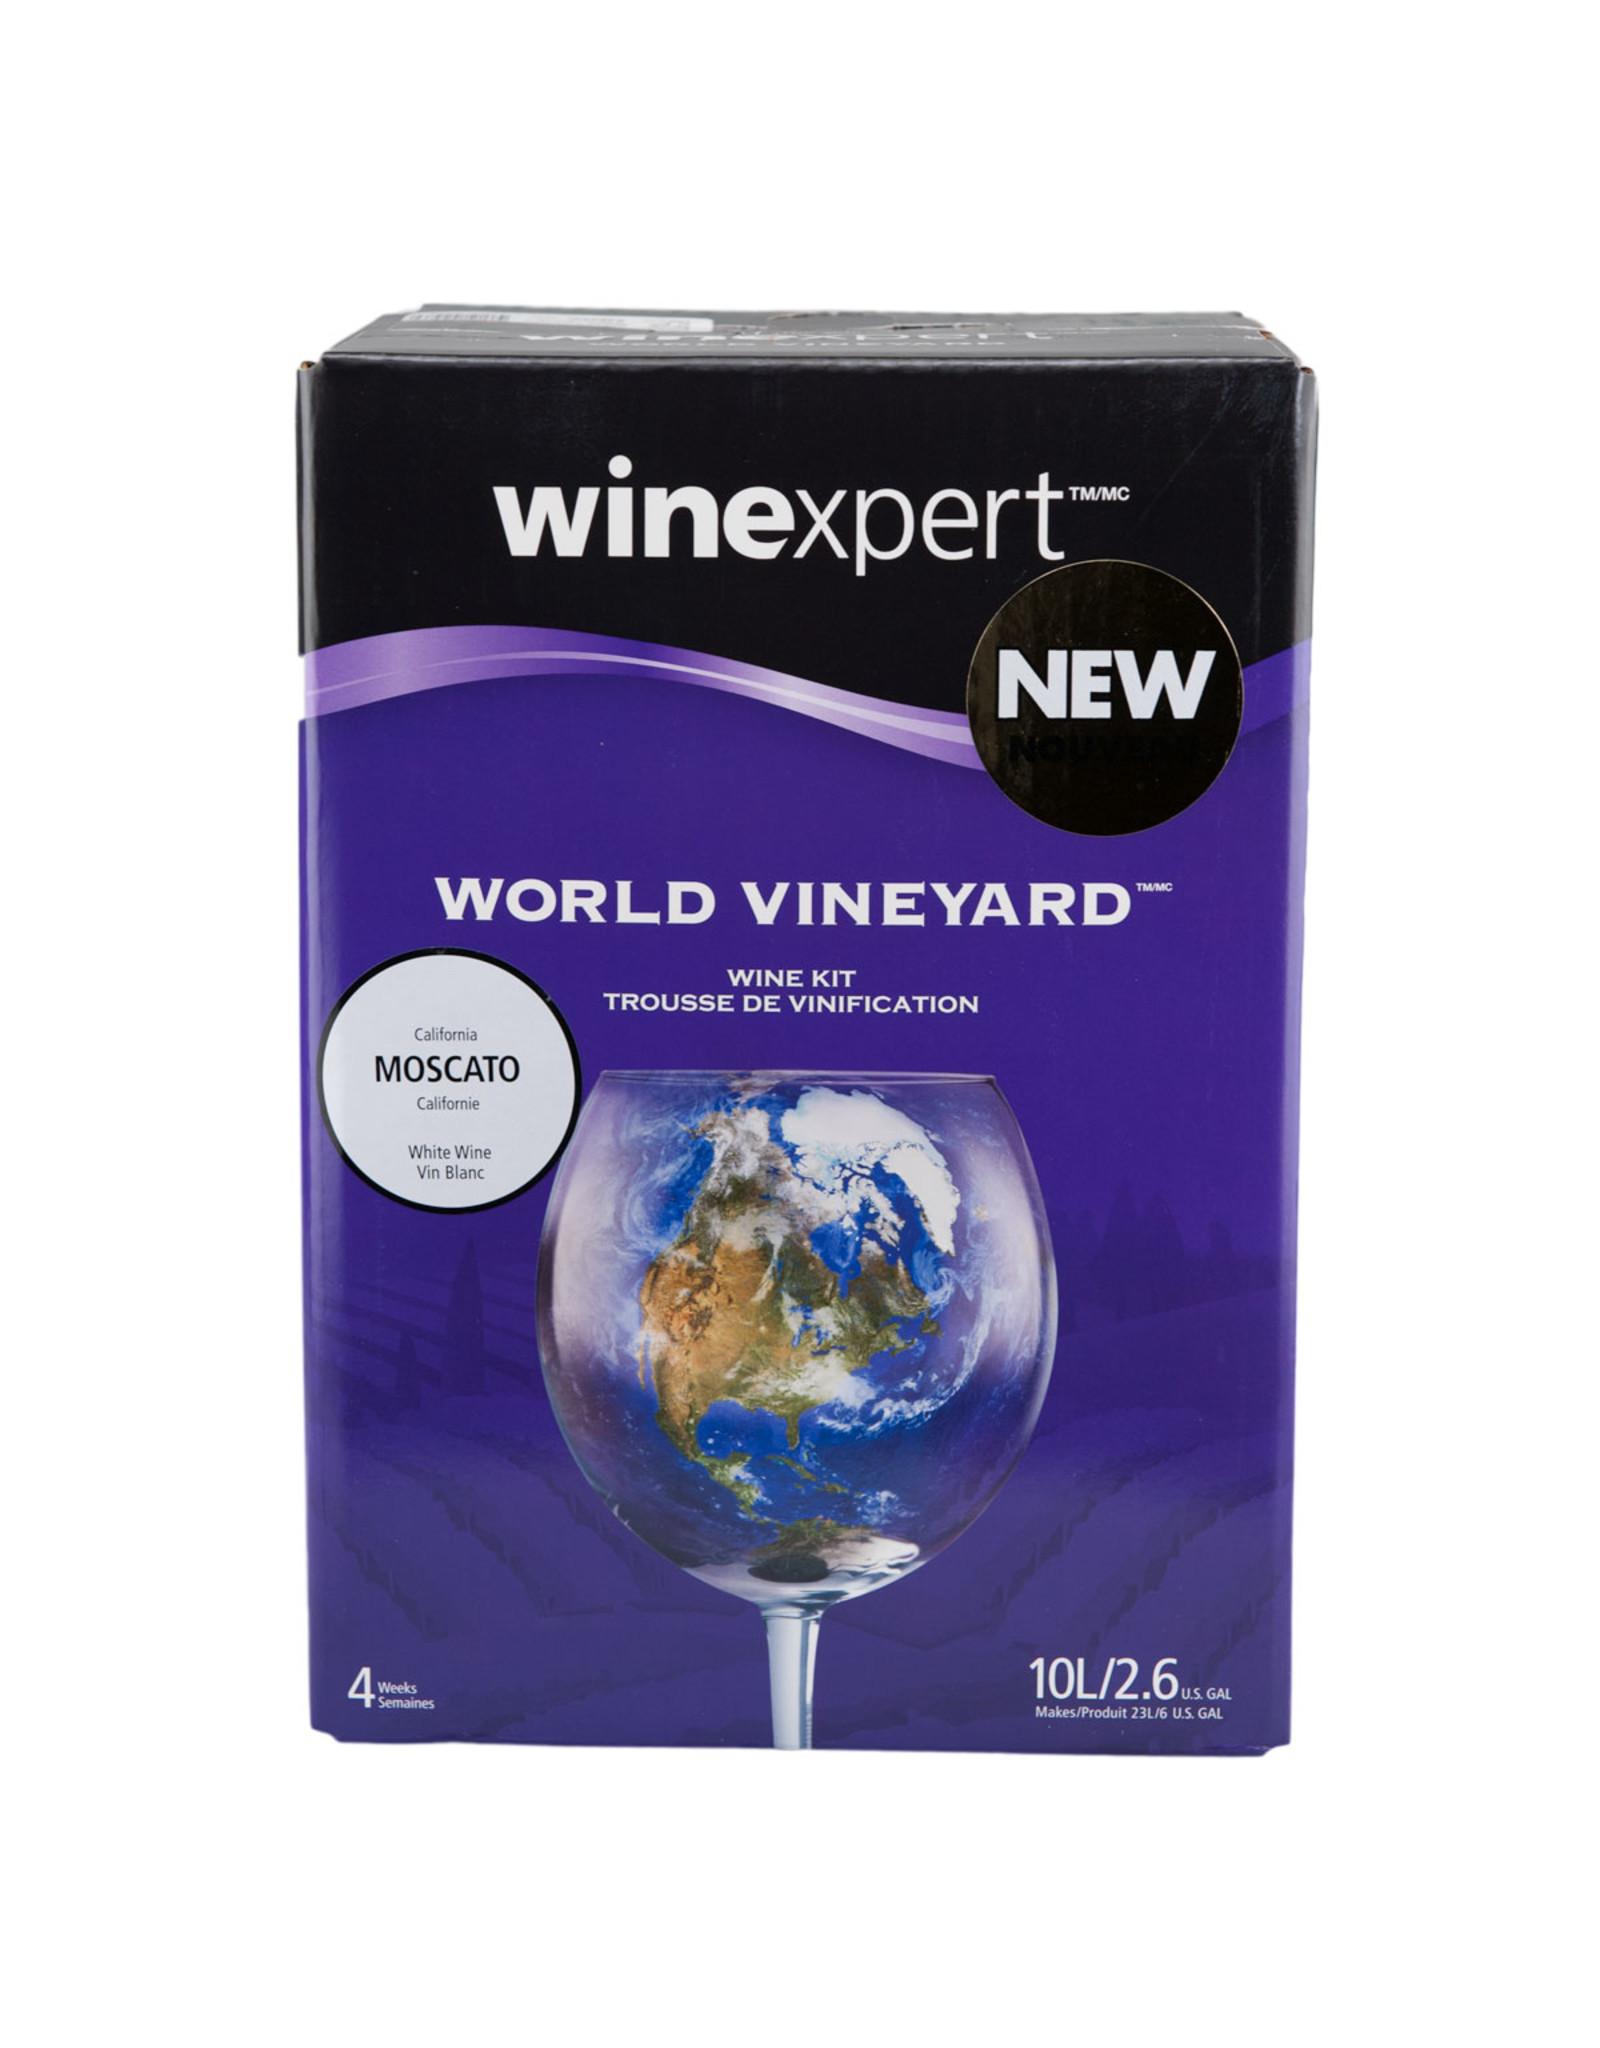 World Vineyard - California Moscato